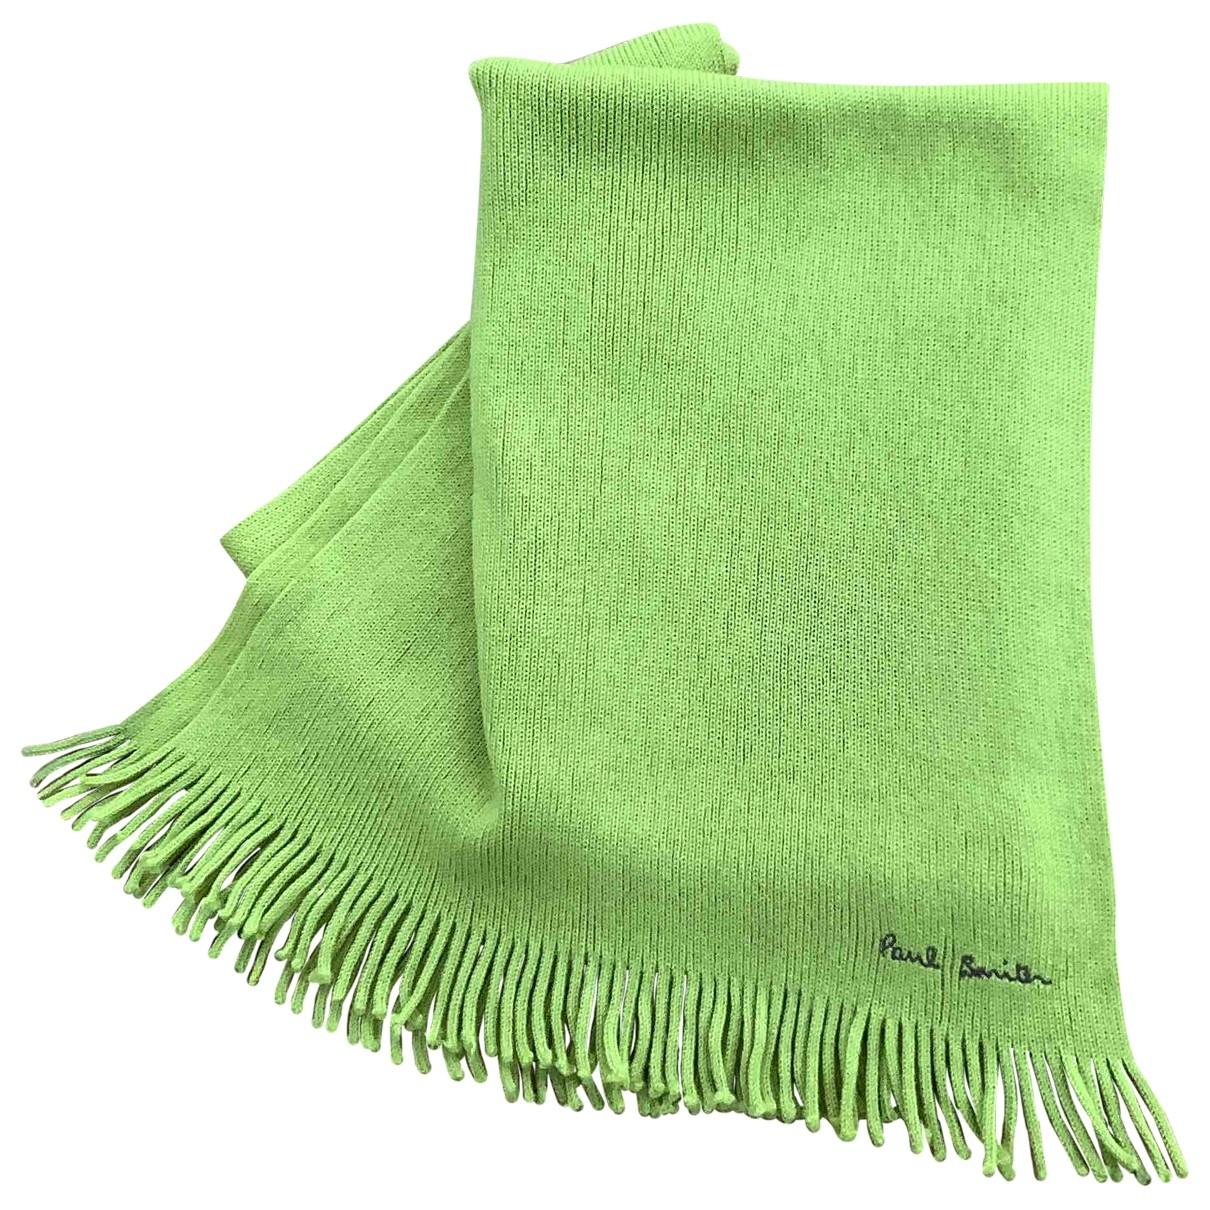 Paul Smith \N Wool scarf & pocket squares for Men \N